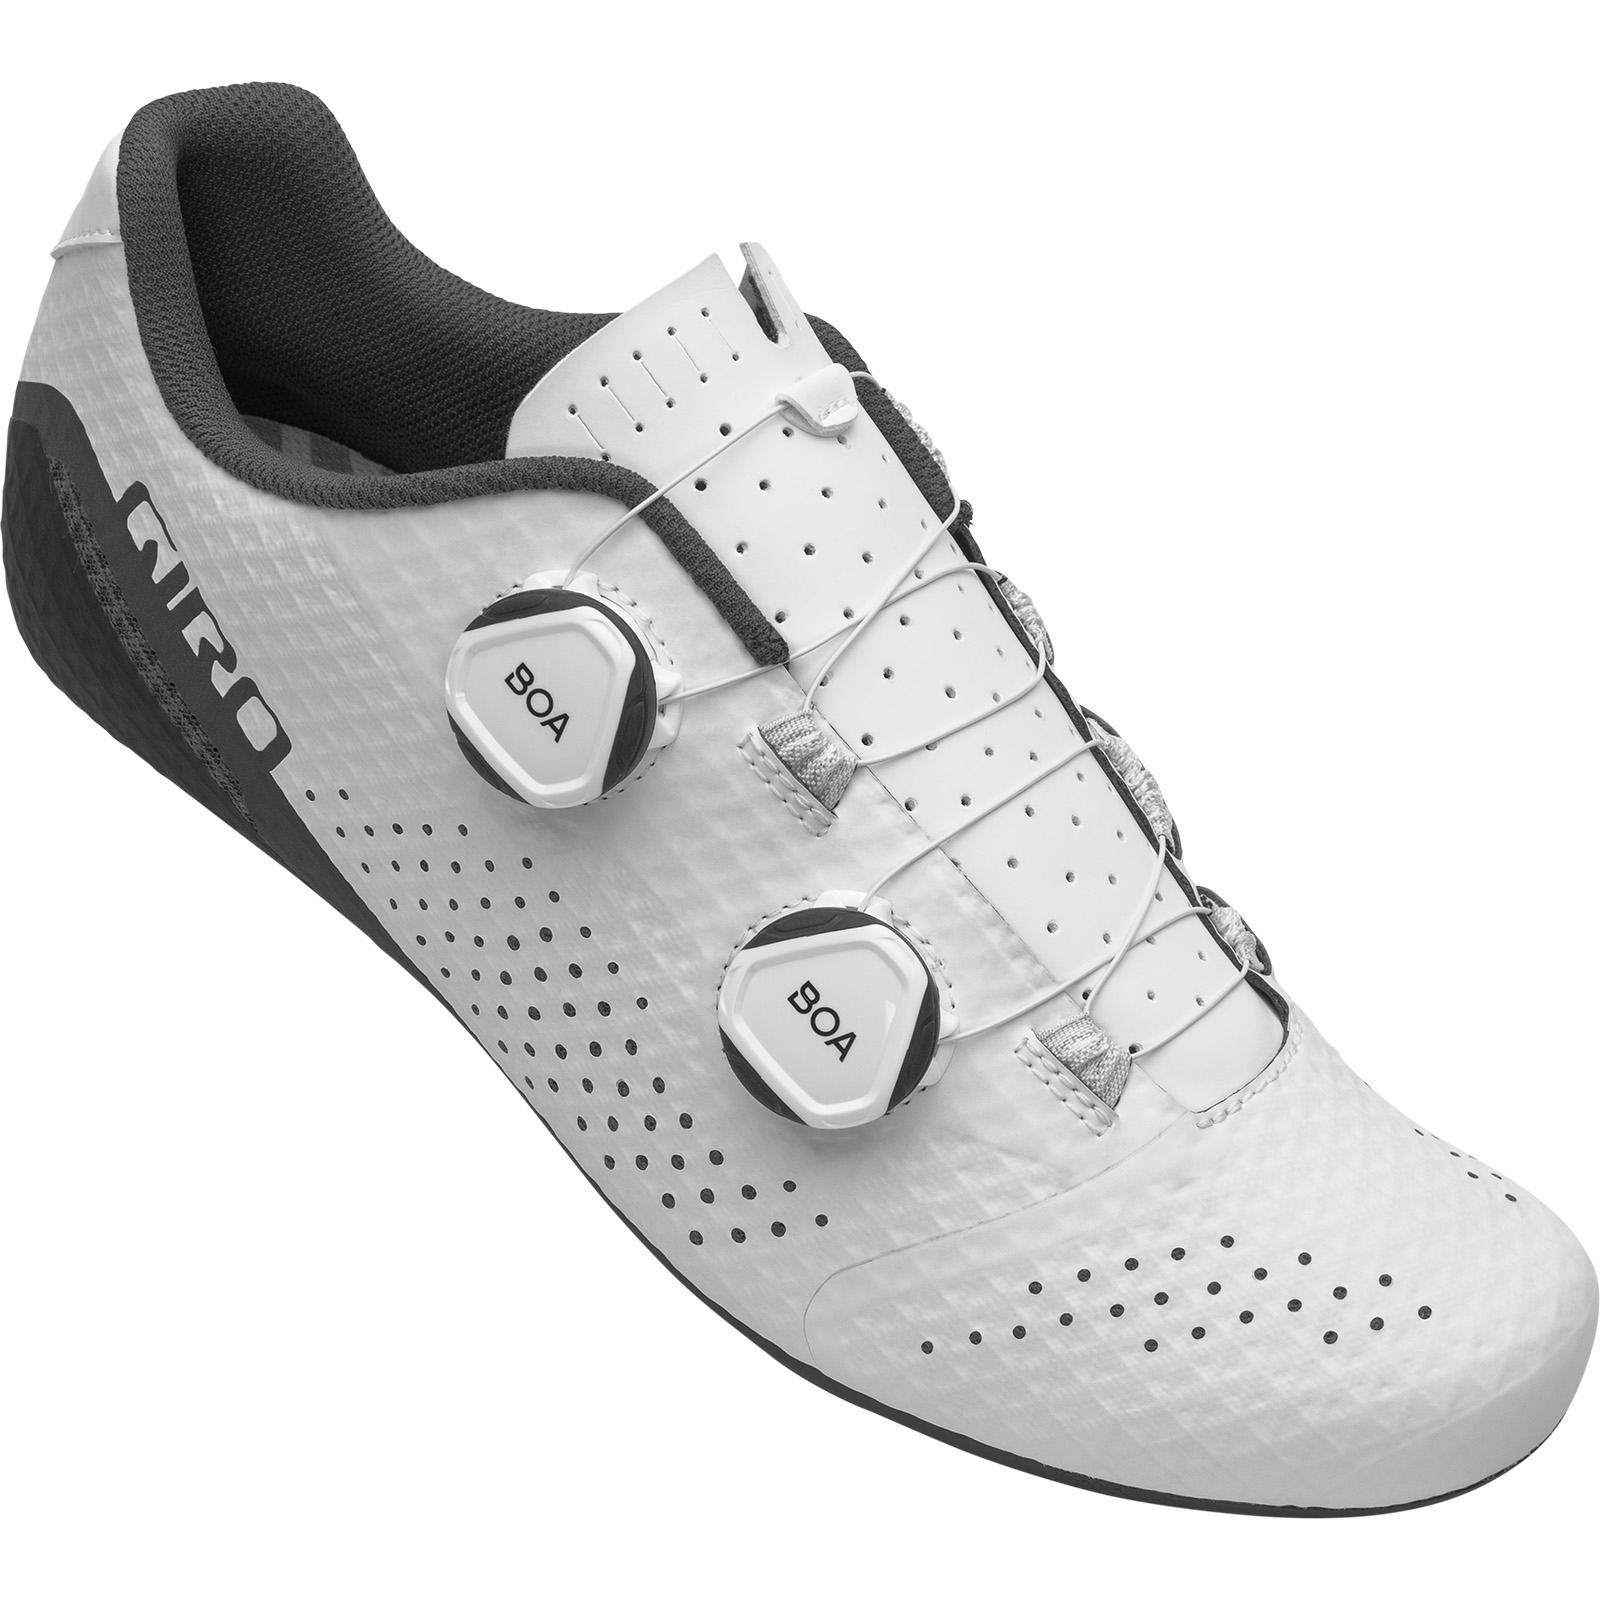 Picture of Giro Regime Women's Road Shoe - white